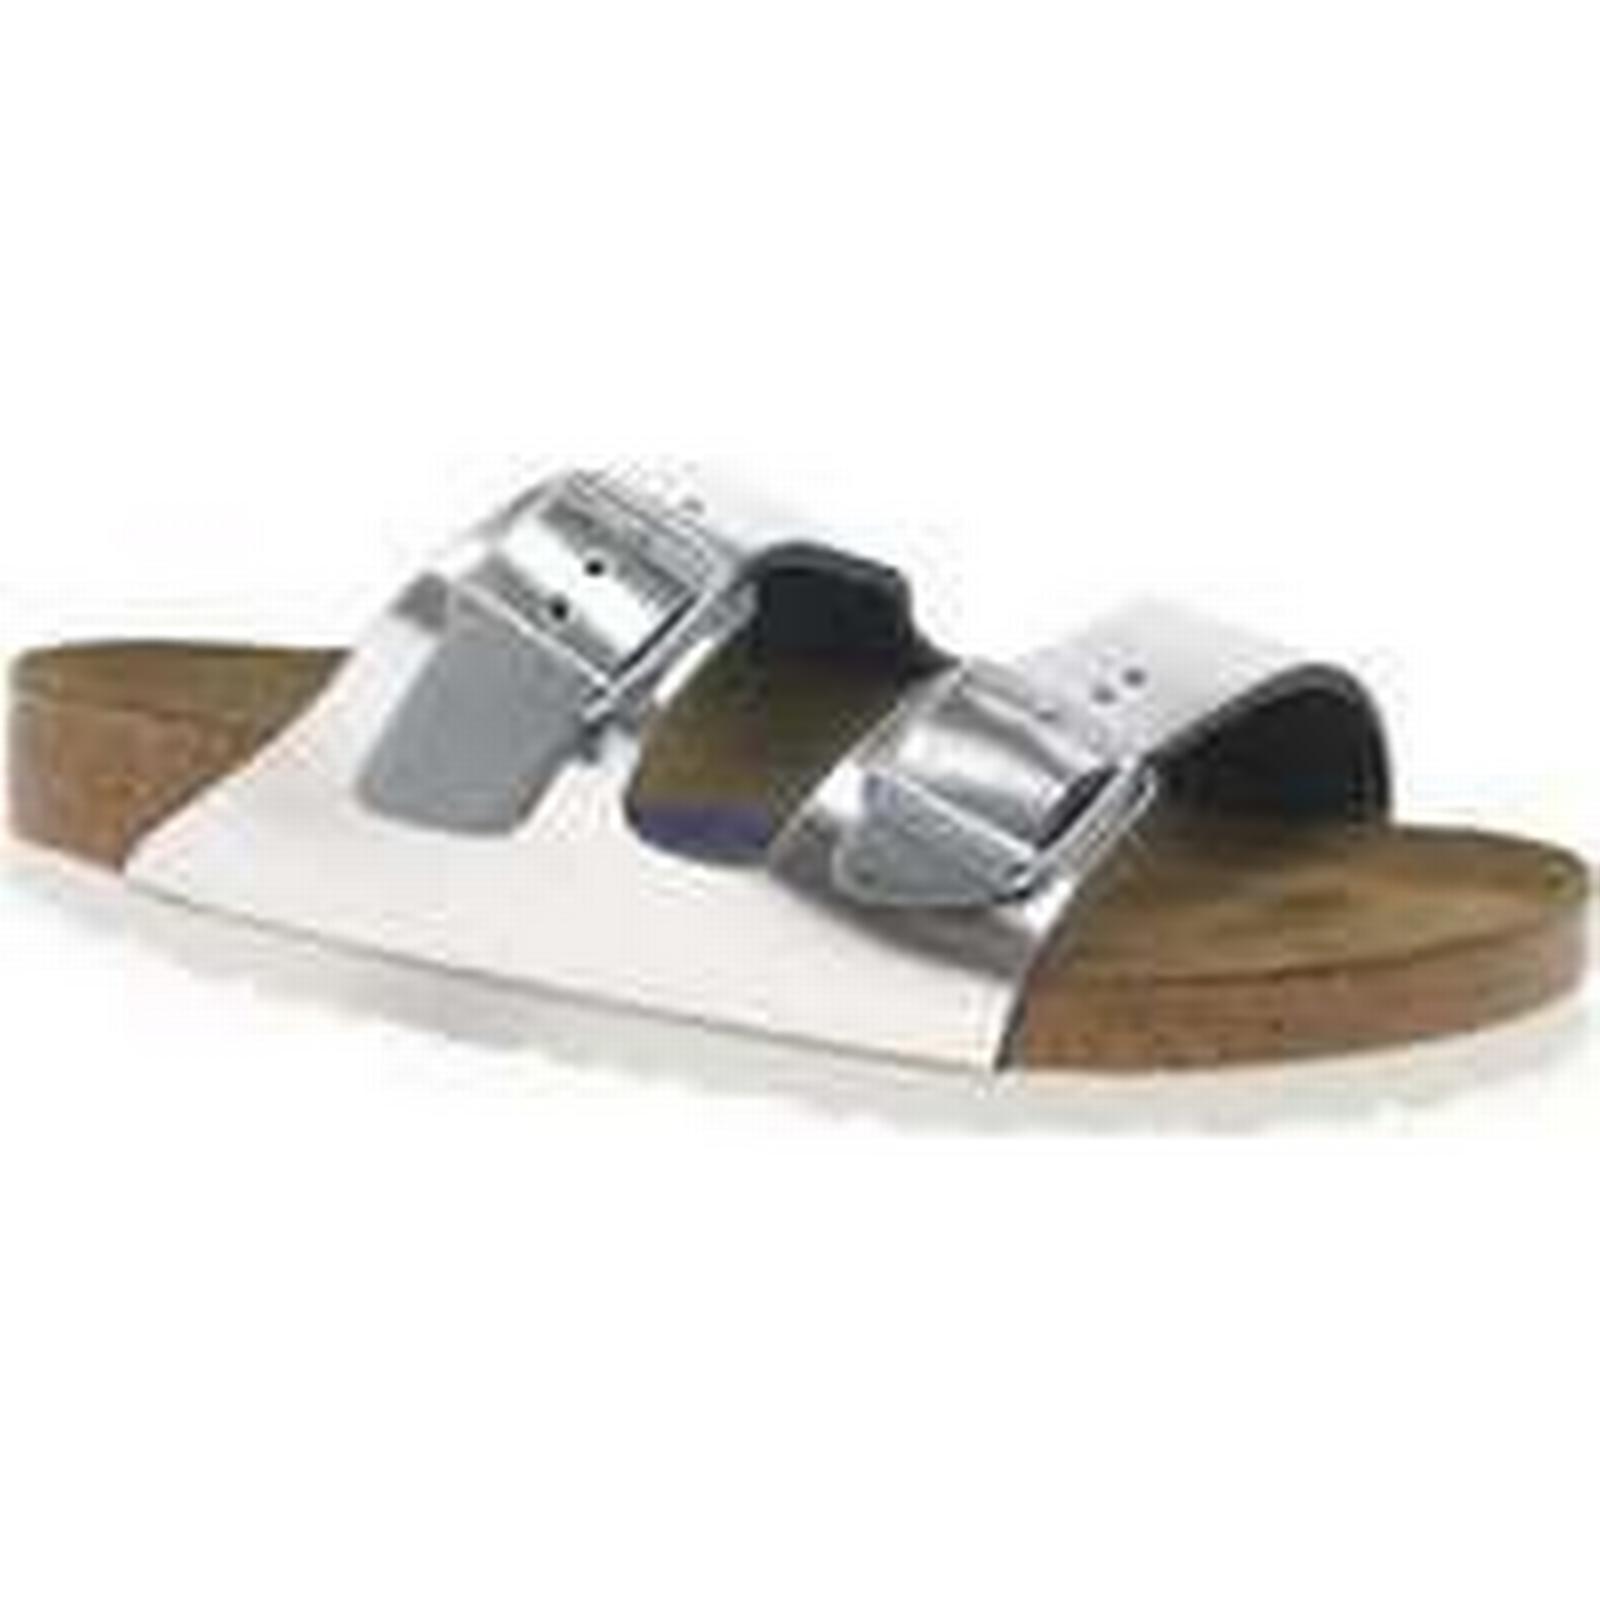 Spartoo.co.uk Sandals Birkenstock Arizona SFB Womens Silver Slide Sandals Spartoo.co.uk women's Sandals in Silver 395578